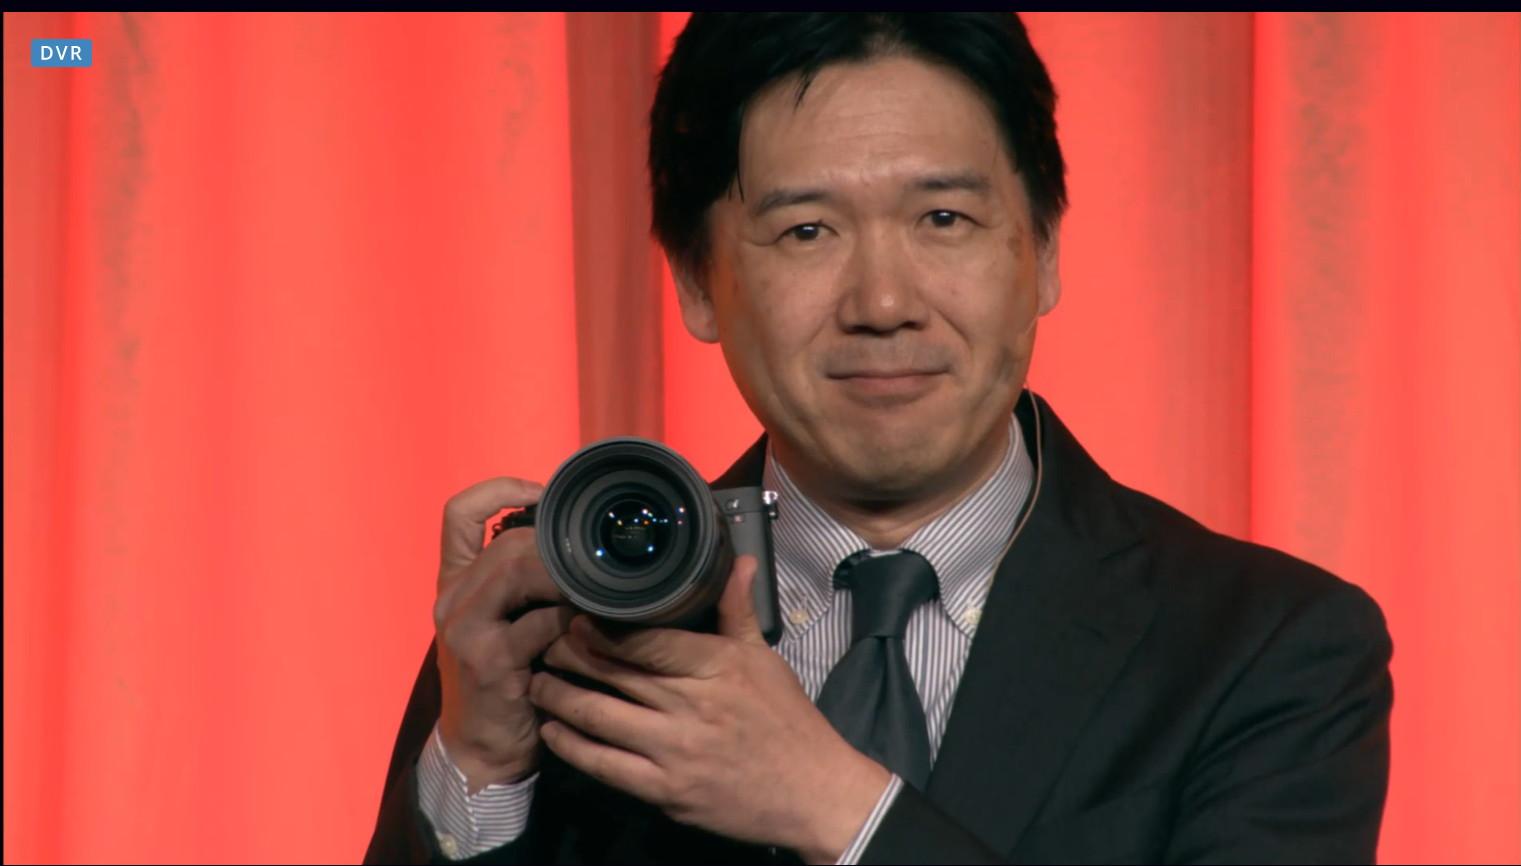 Sony 發表 A7R IV ,搭載 61MP 背照式元件、 15 級動態範圍、源自 A9 的全時瞳孔追焦、物體技術